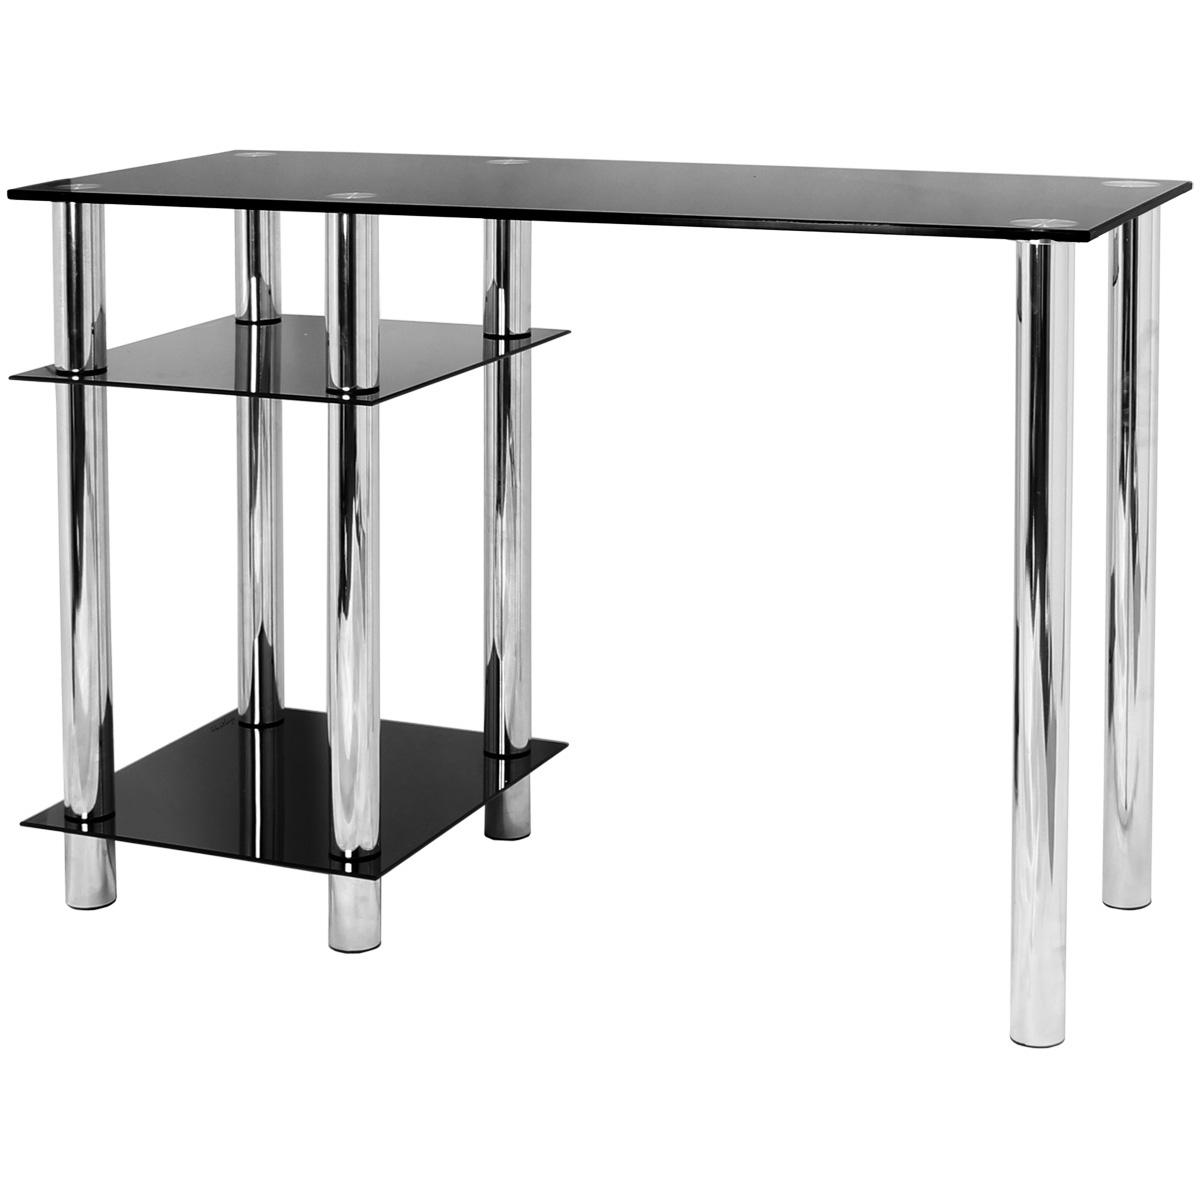 HARTLEYS BLACK GLASS COMPUTER DESK & BASE UNIT SHELF OFFICE TABLE PC